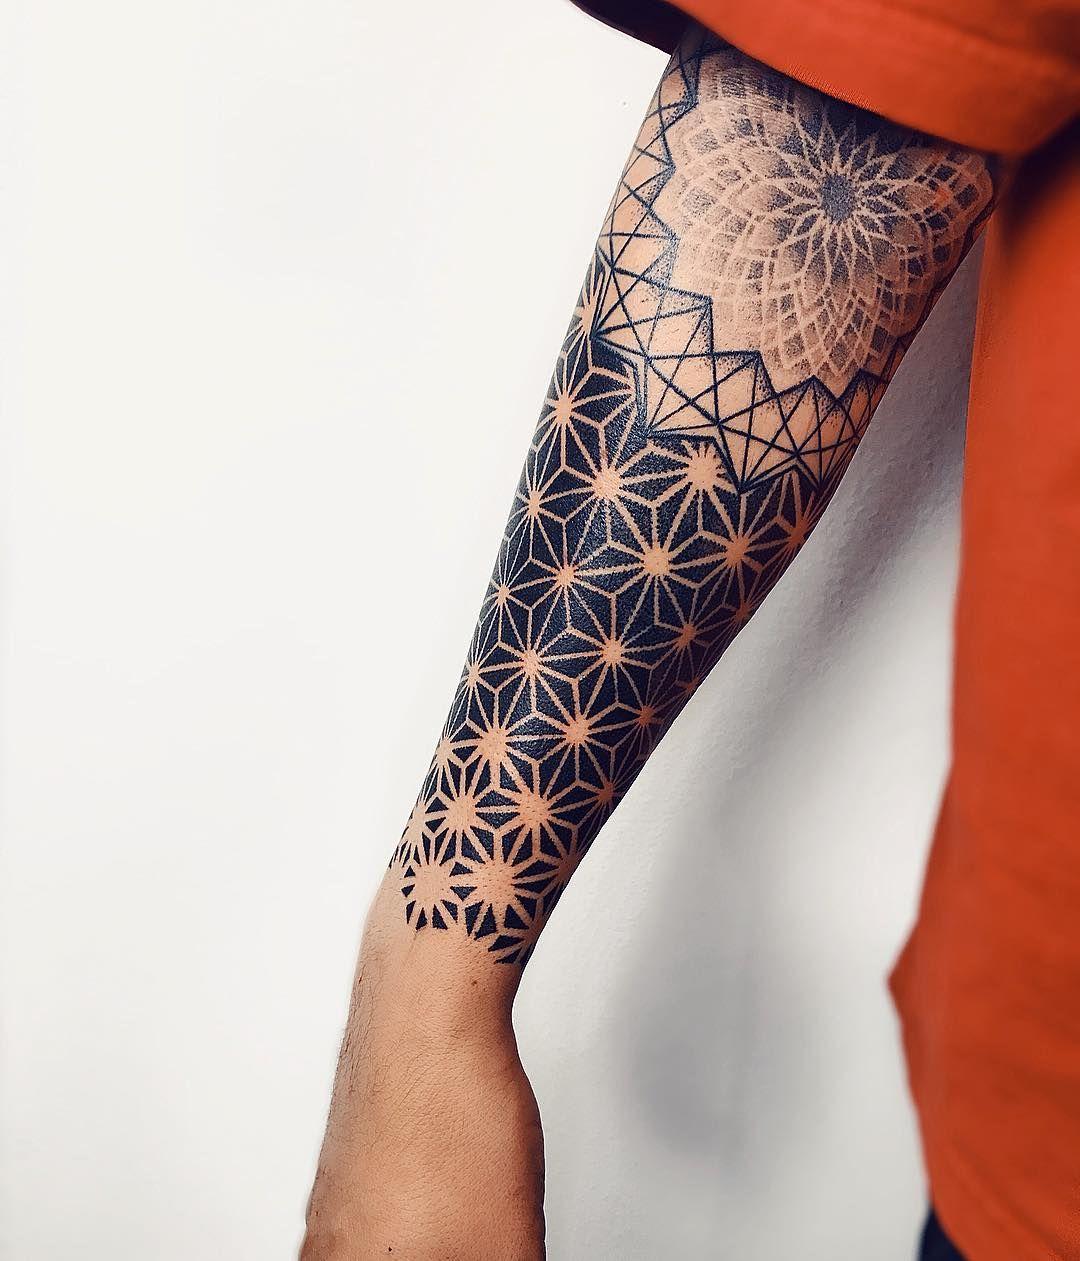 Pin von Ink about you auf Geometric tattoos | Pinterest | Tattoo ... - Armreif Tattoo